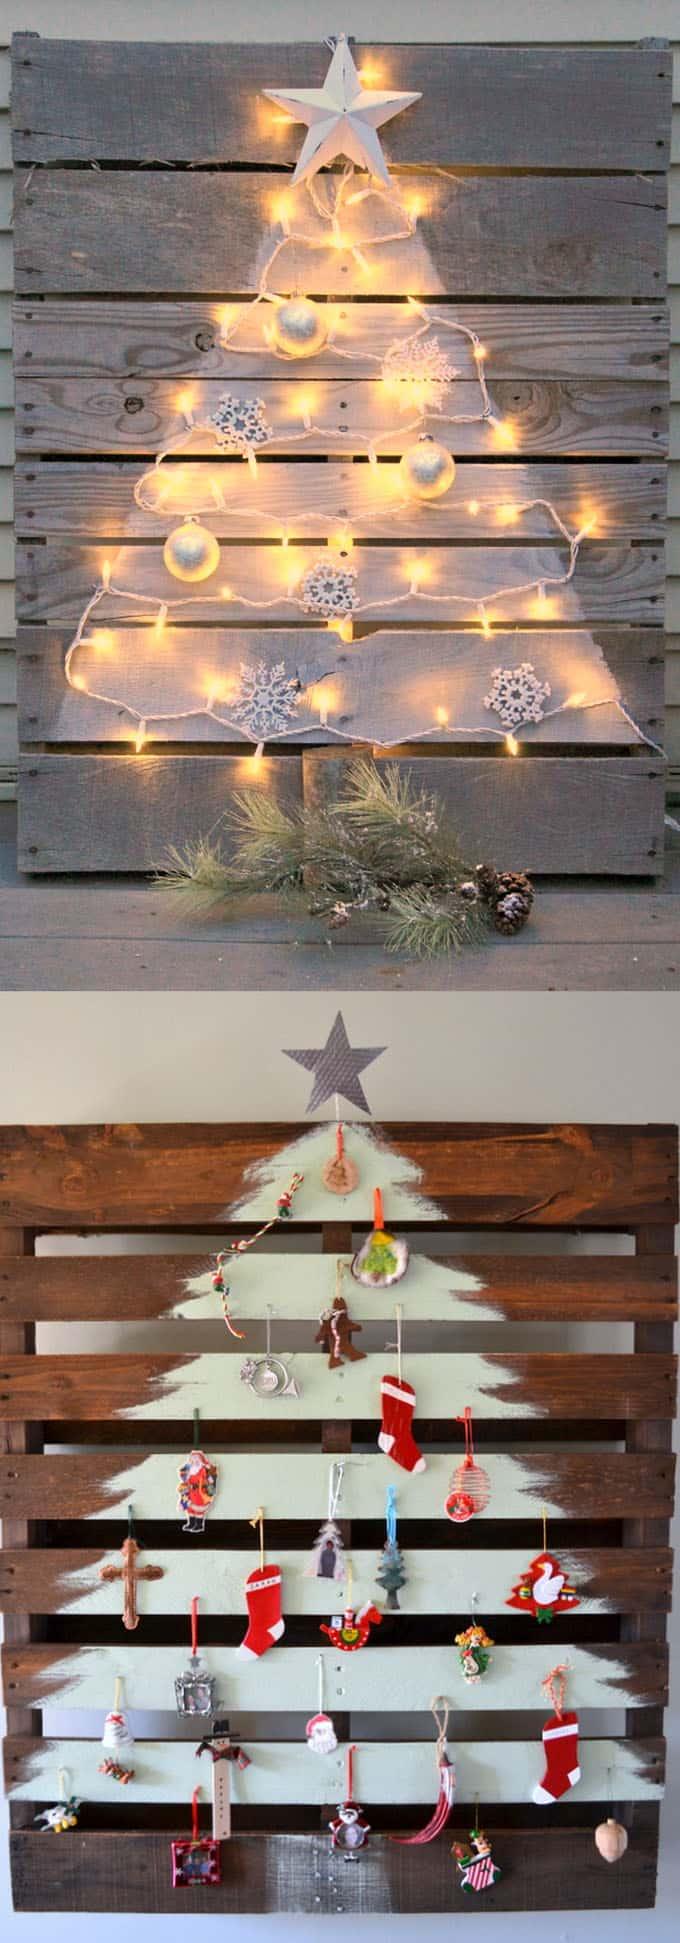 diy christmas tree ideas apieceofrainbow 6 - 48 Amazing Alternative Christmas Tree Ideas